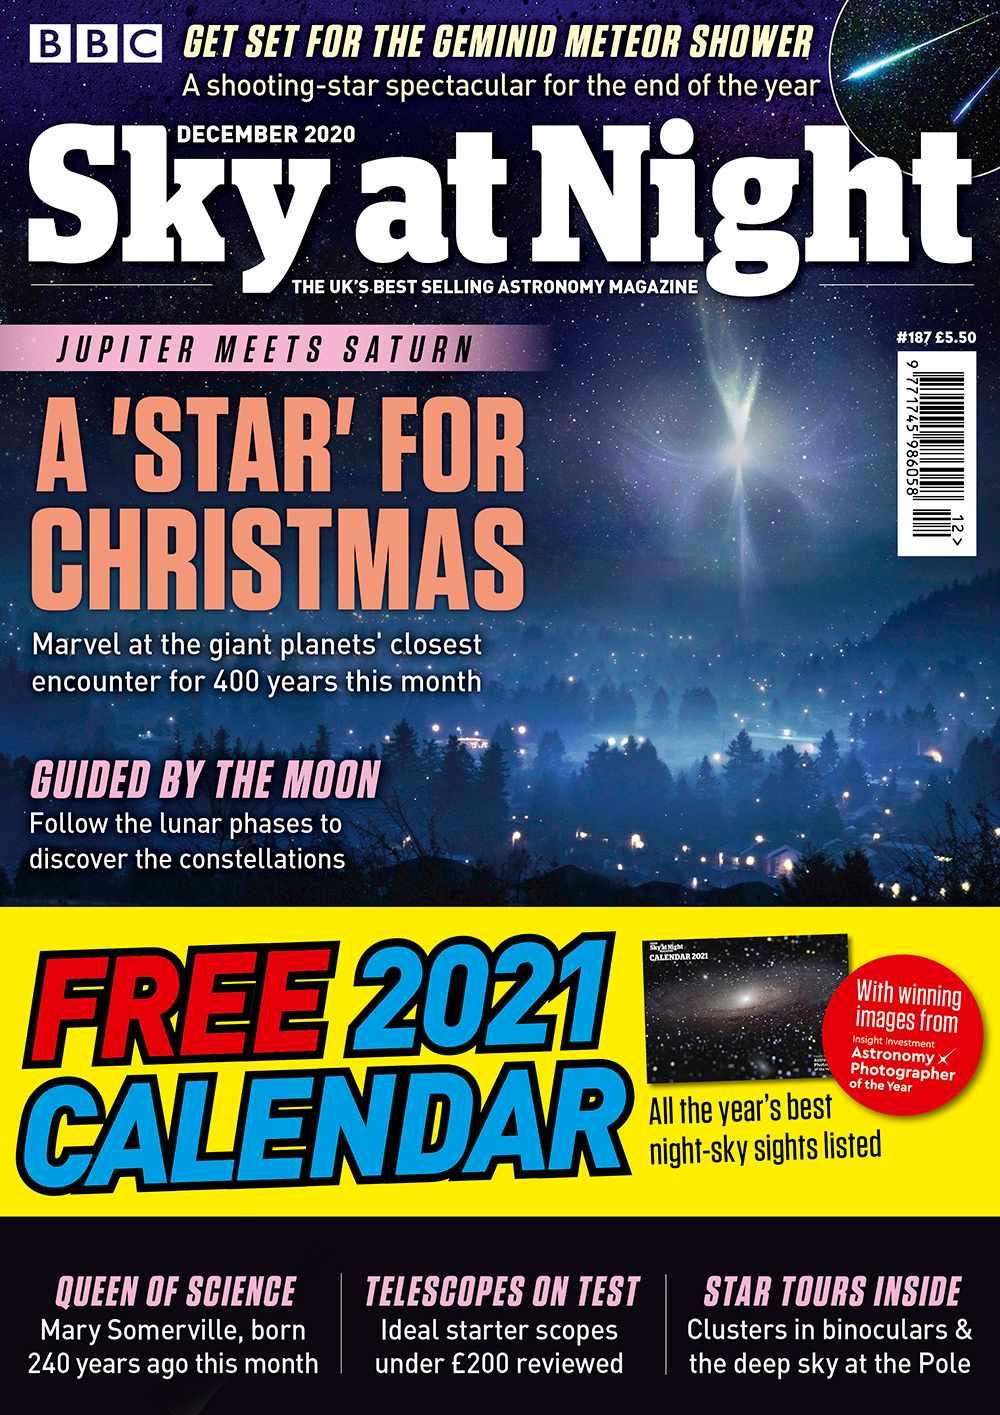 BBC Sky at Night Magazine December 2020 issue